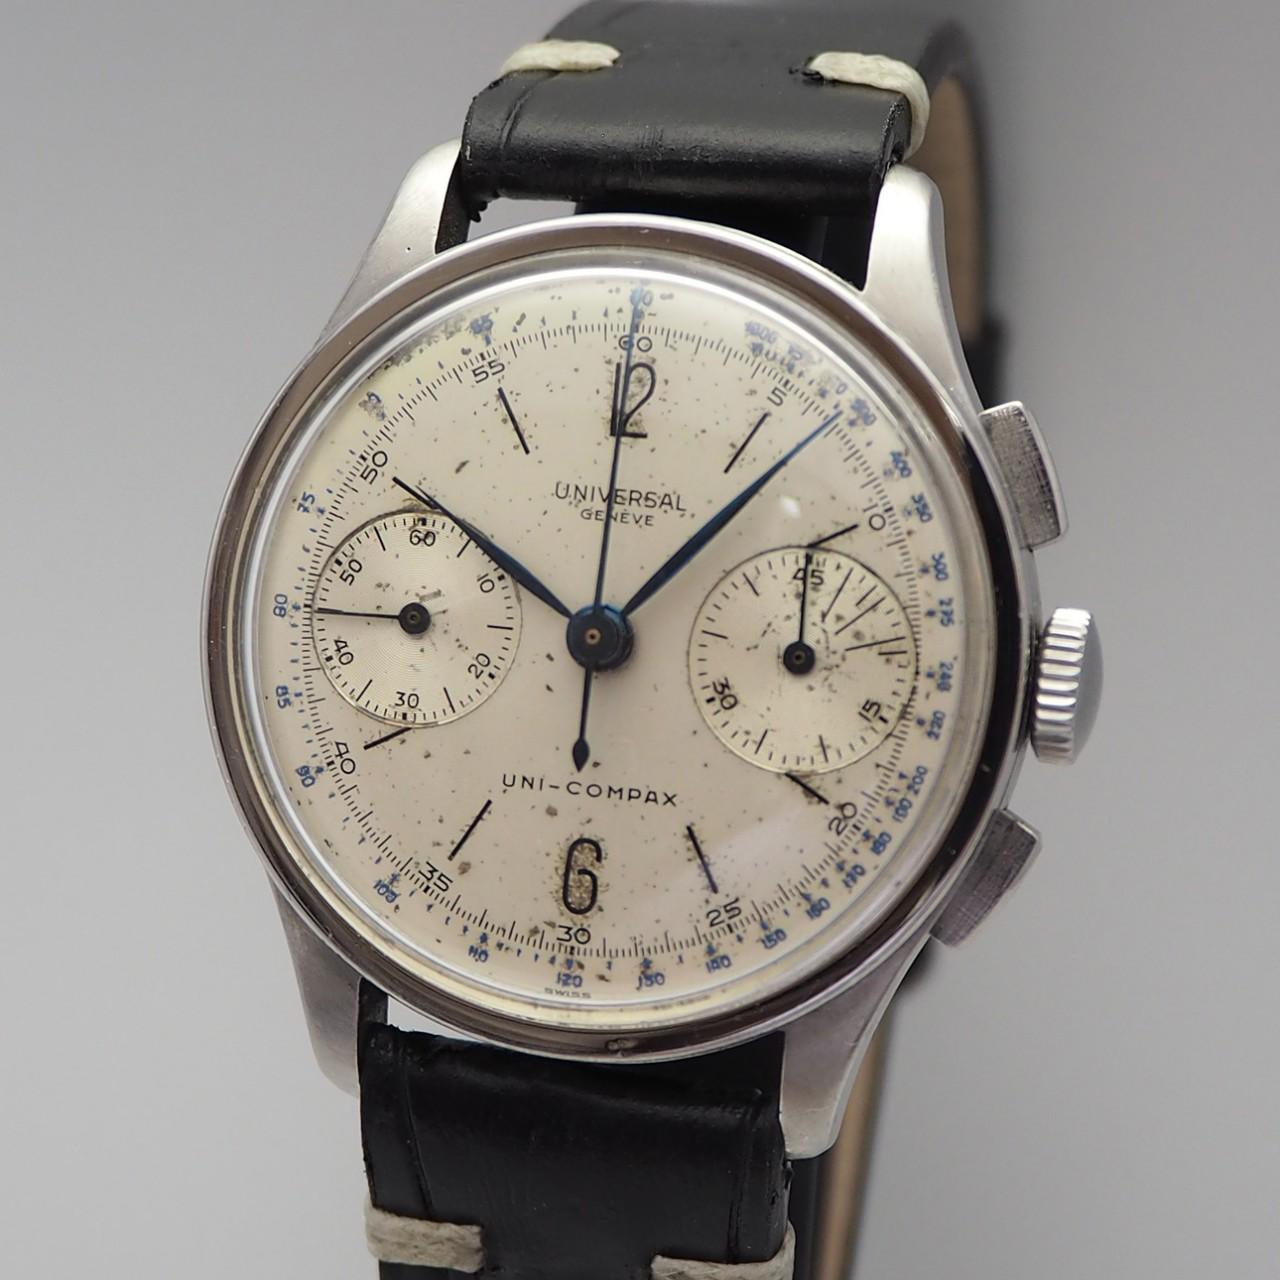 Universal Geneve Chronograph vintage 22420 Cal.285